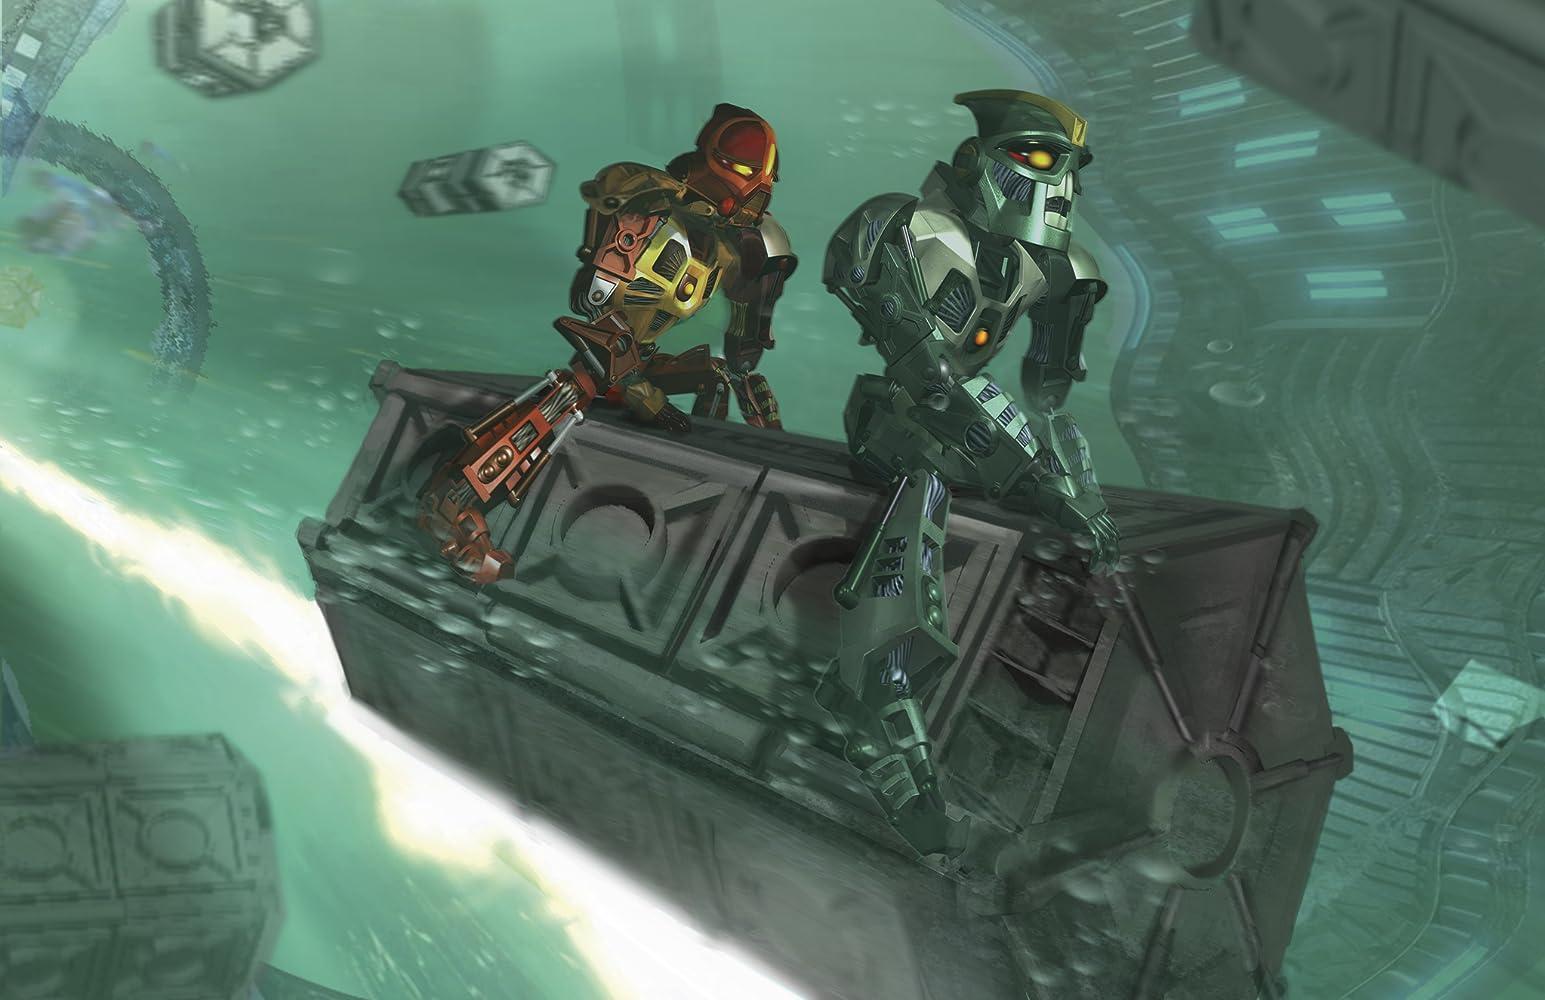 кадр №3 из фильма Бионикл 2: Легенда Метру Нуи (2004)